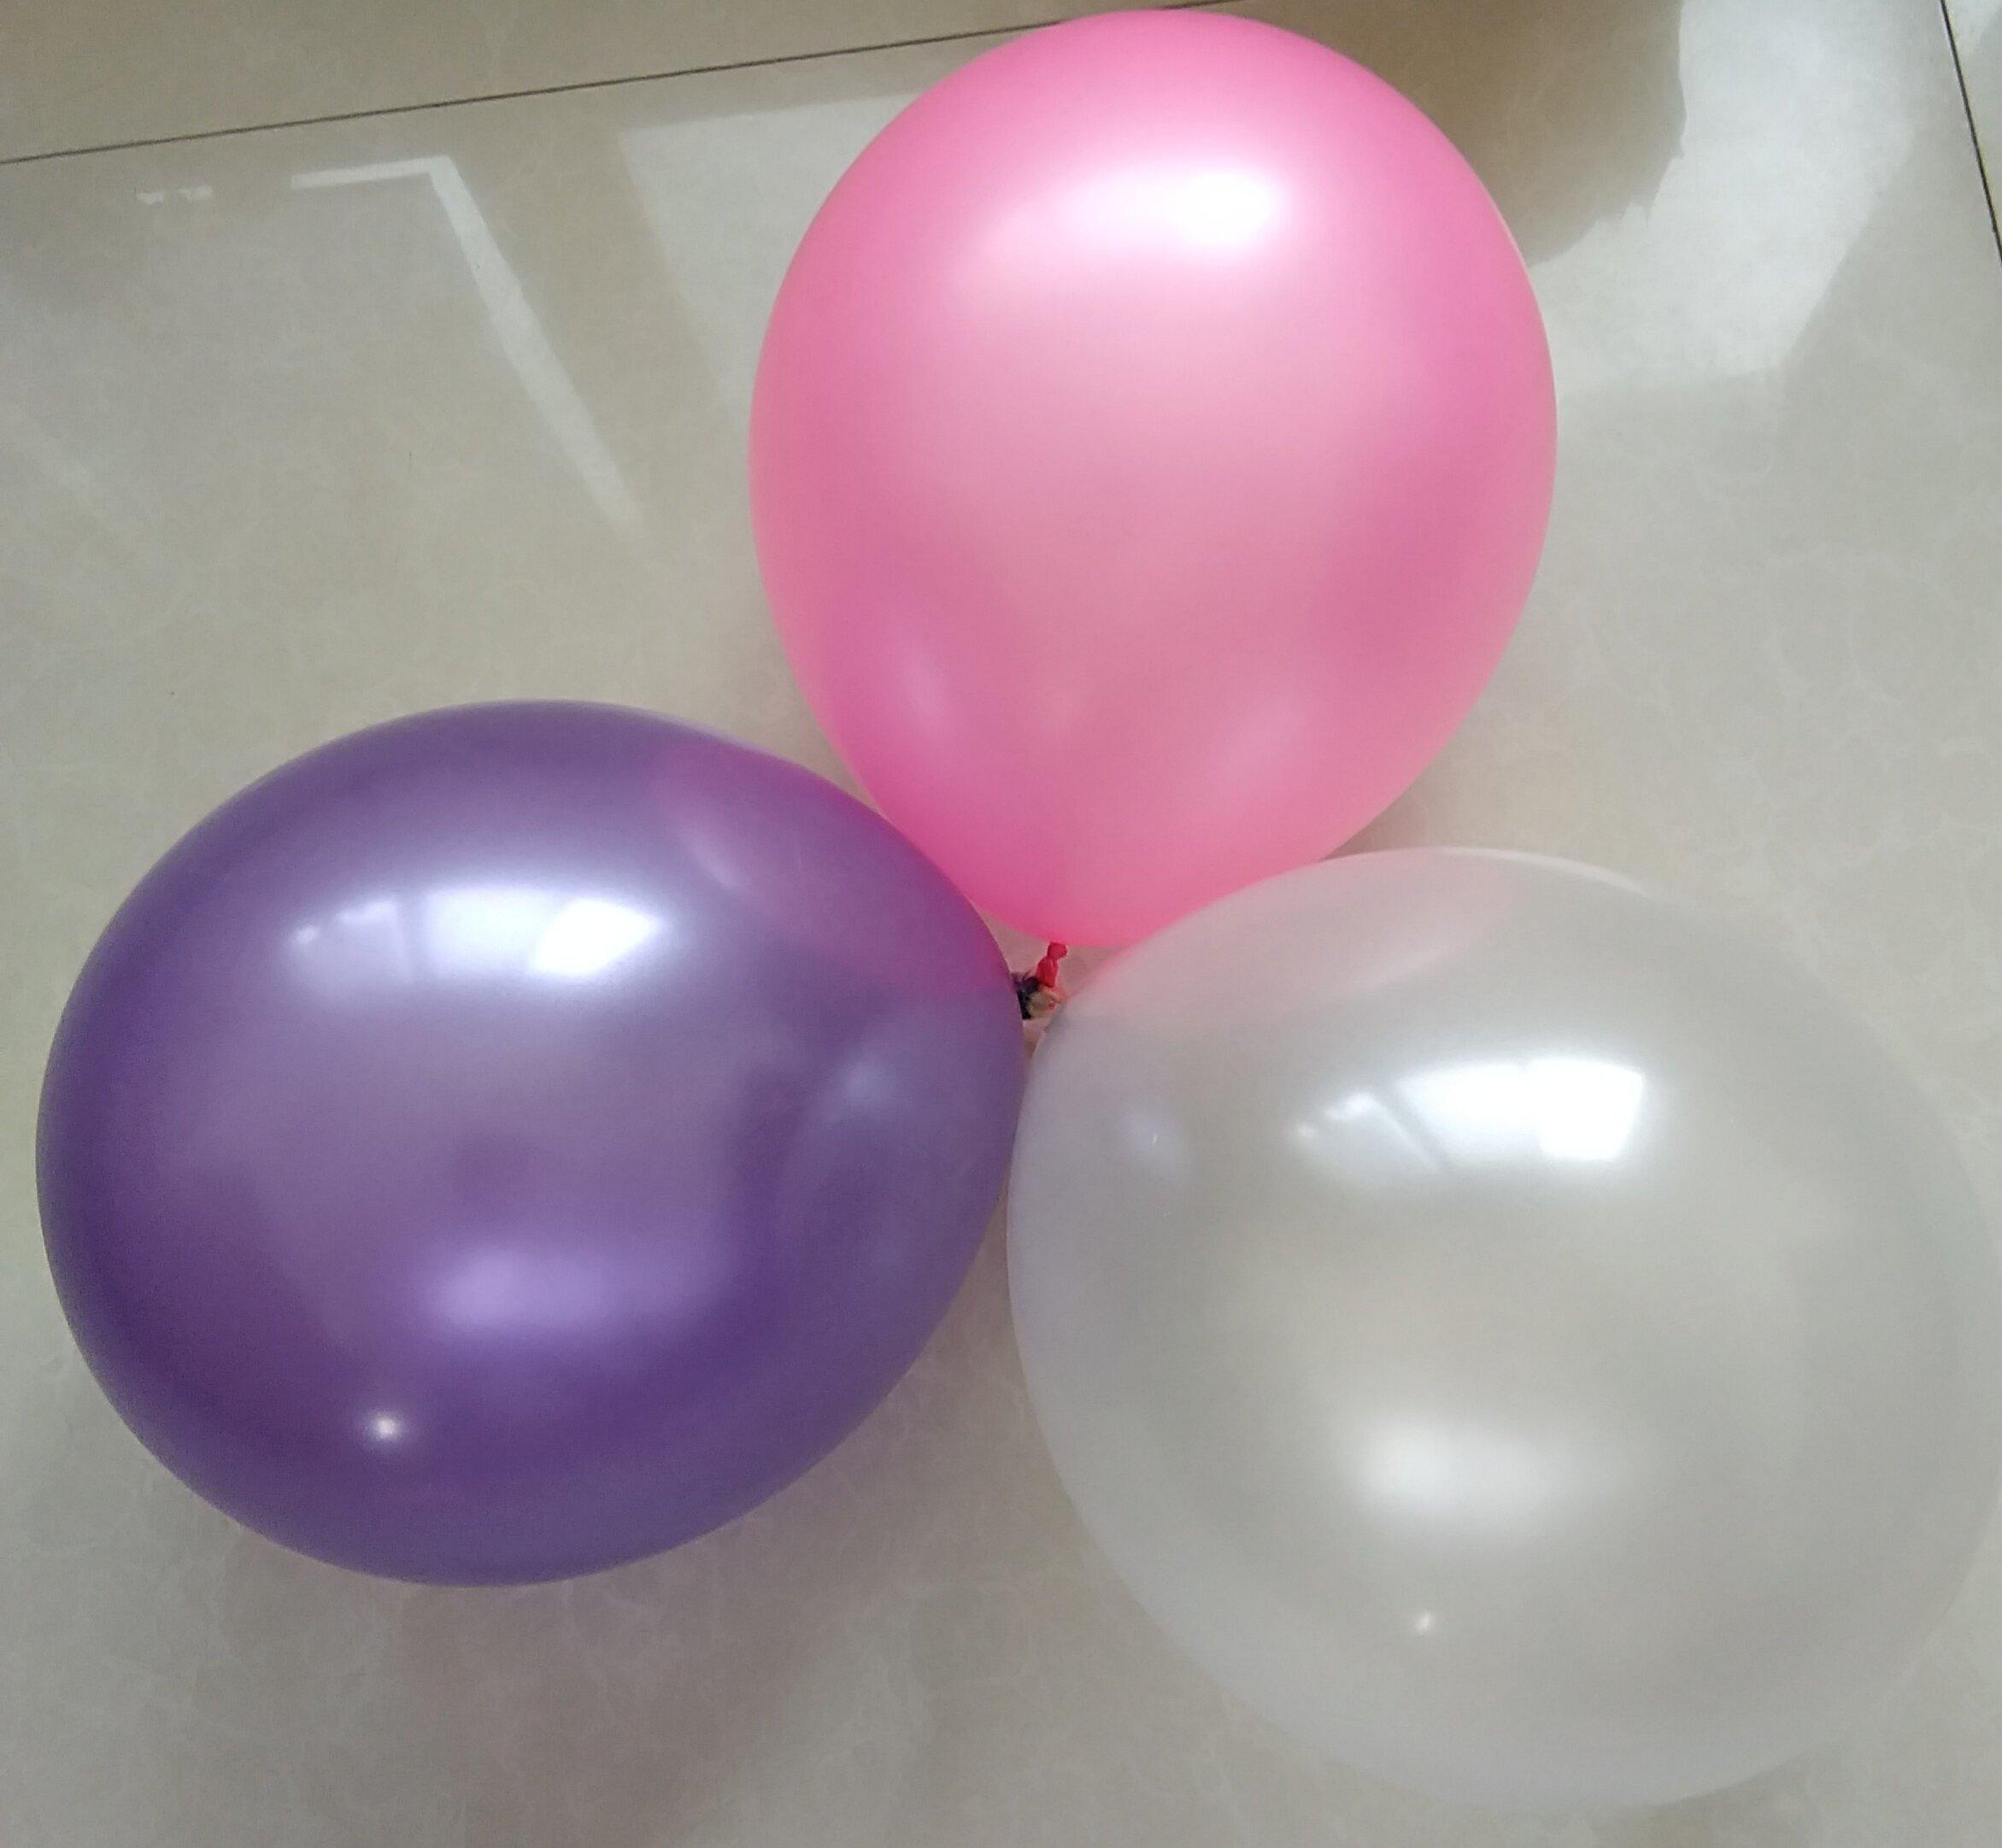 100 pcs Latex Balloons 12 Inch 2.8g Birthday Wedding Supply Kids Toy (pink&purple&white)